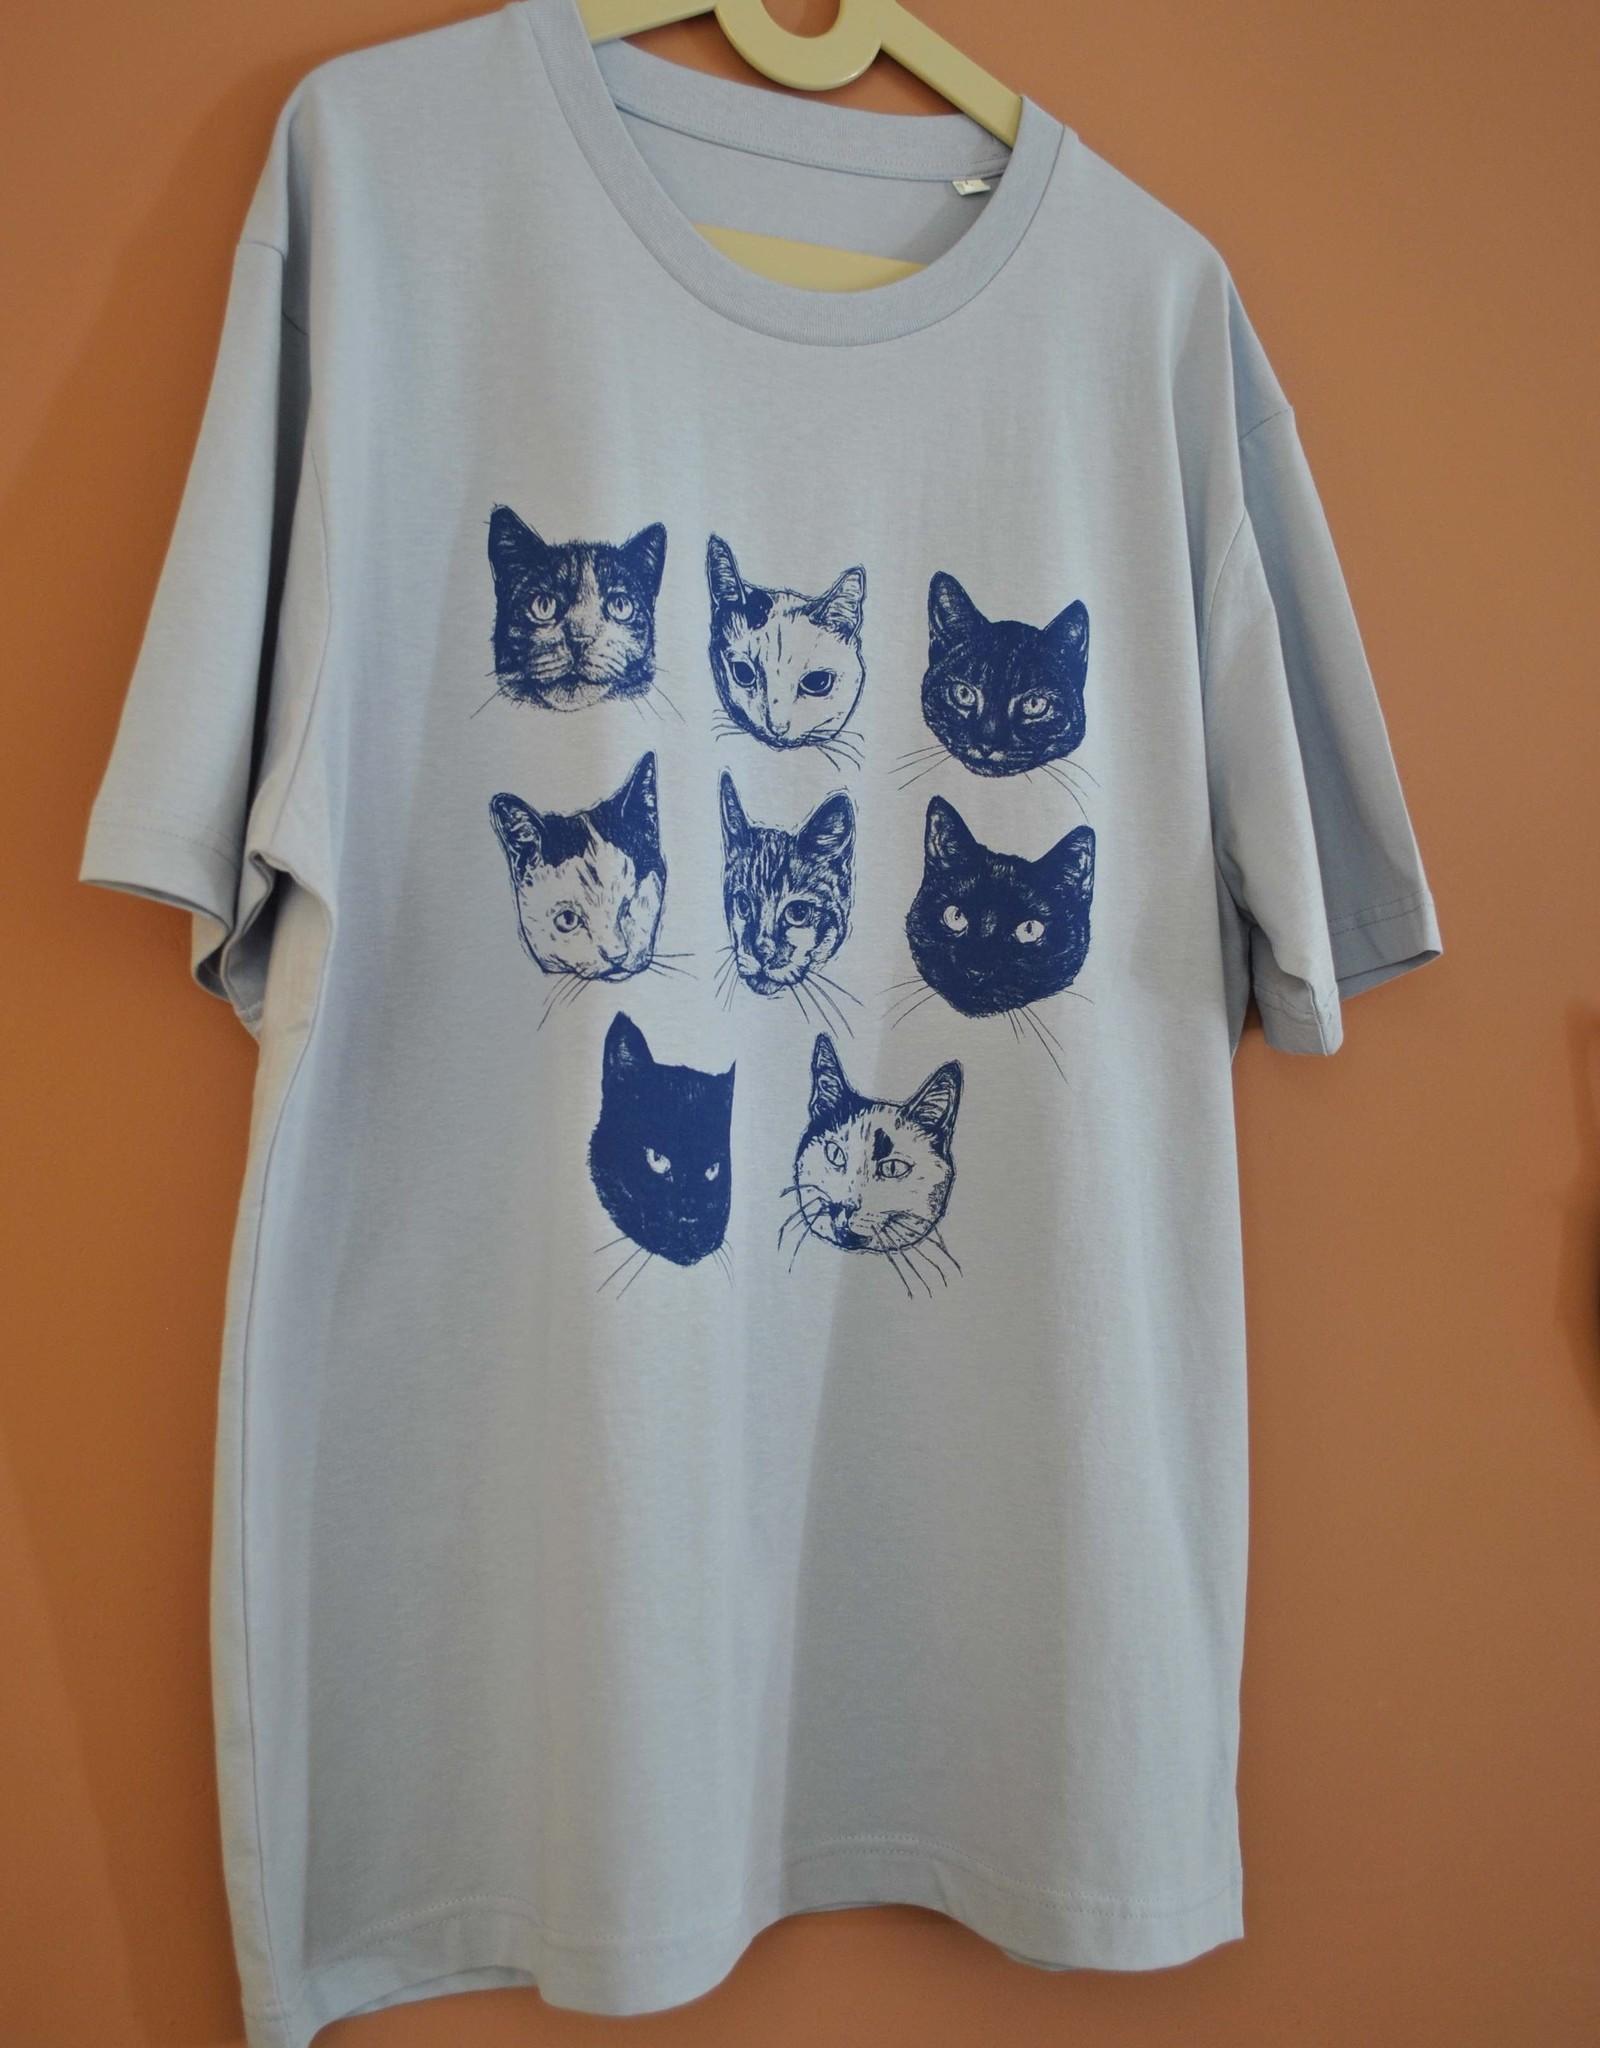 Kopjes Kopjes portretjes - T-shirt - Boxy- Blue- XL